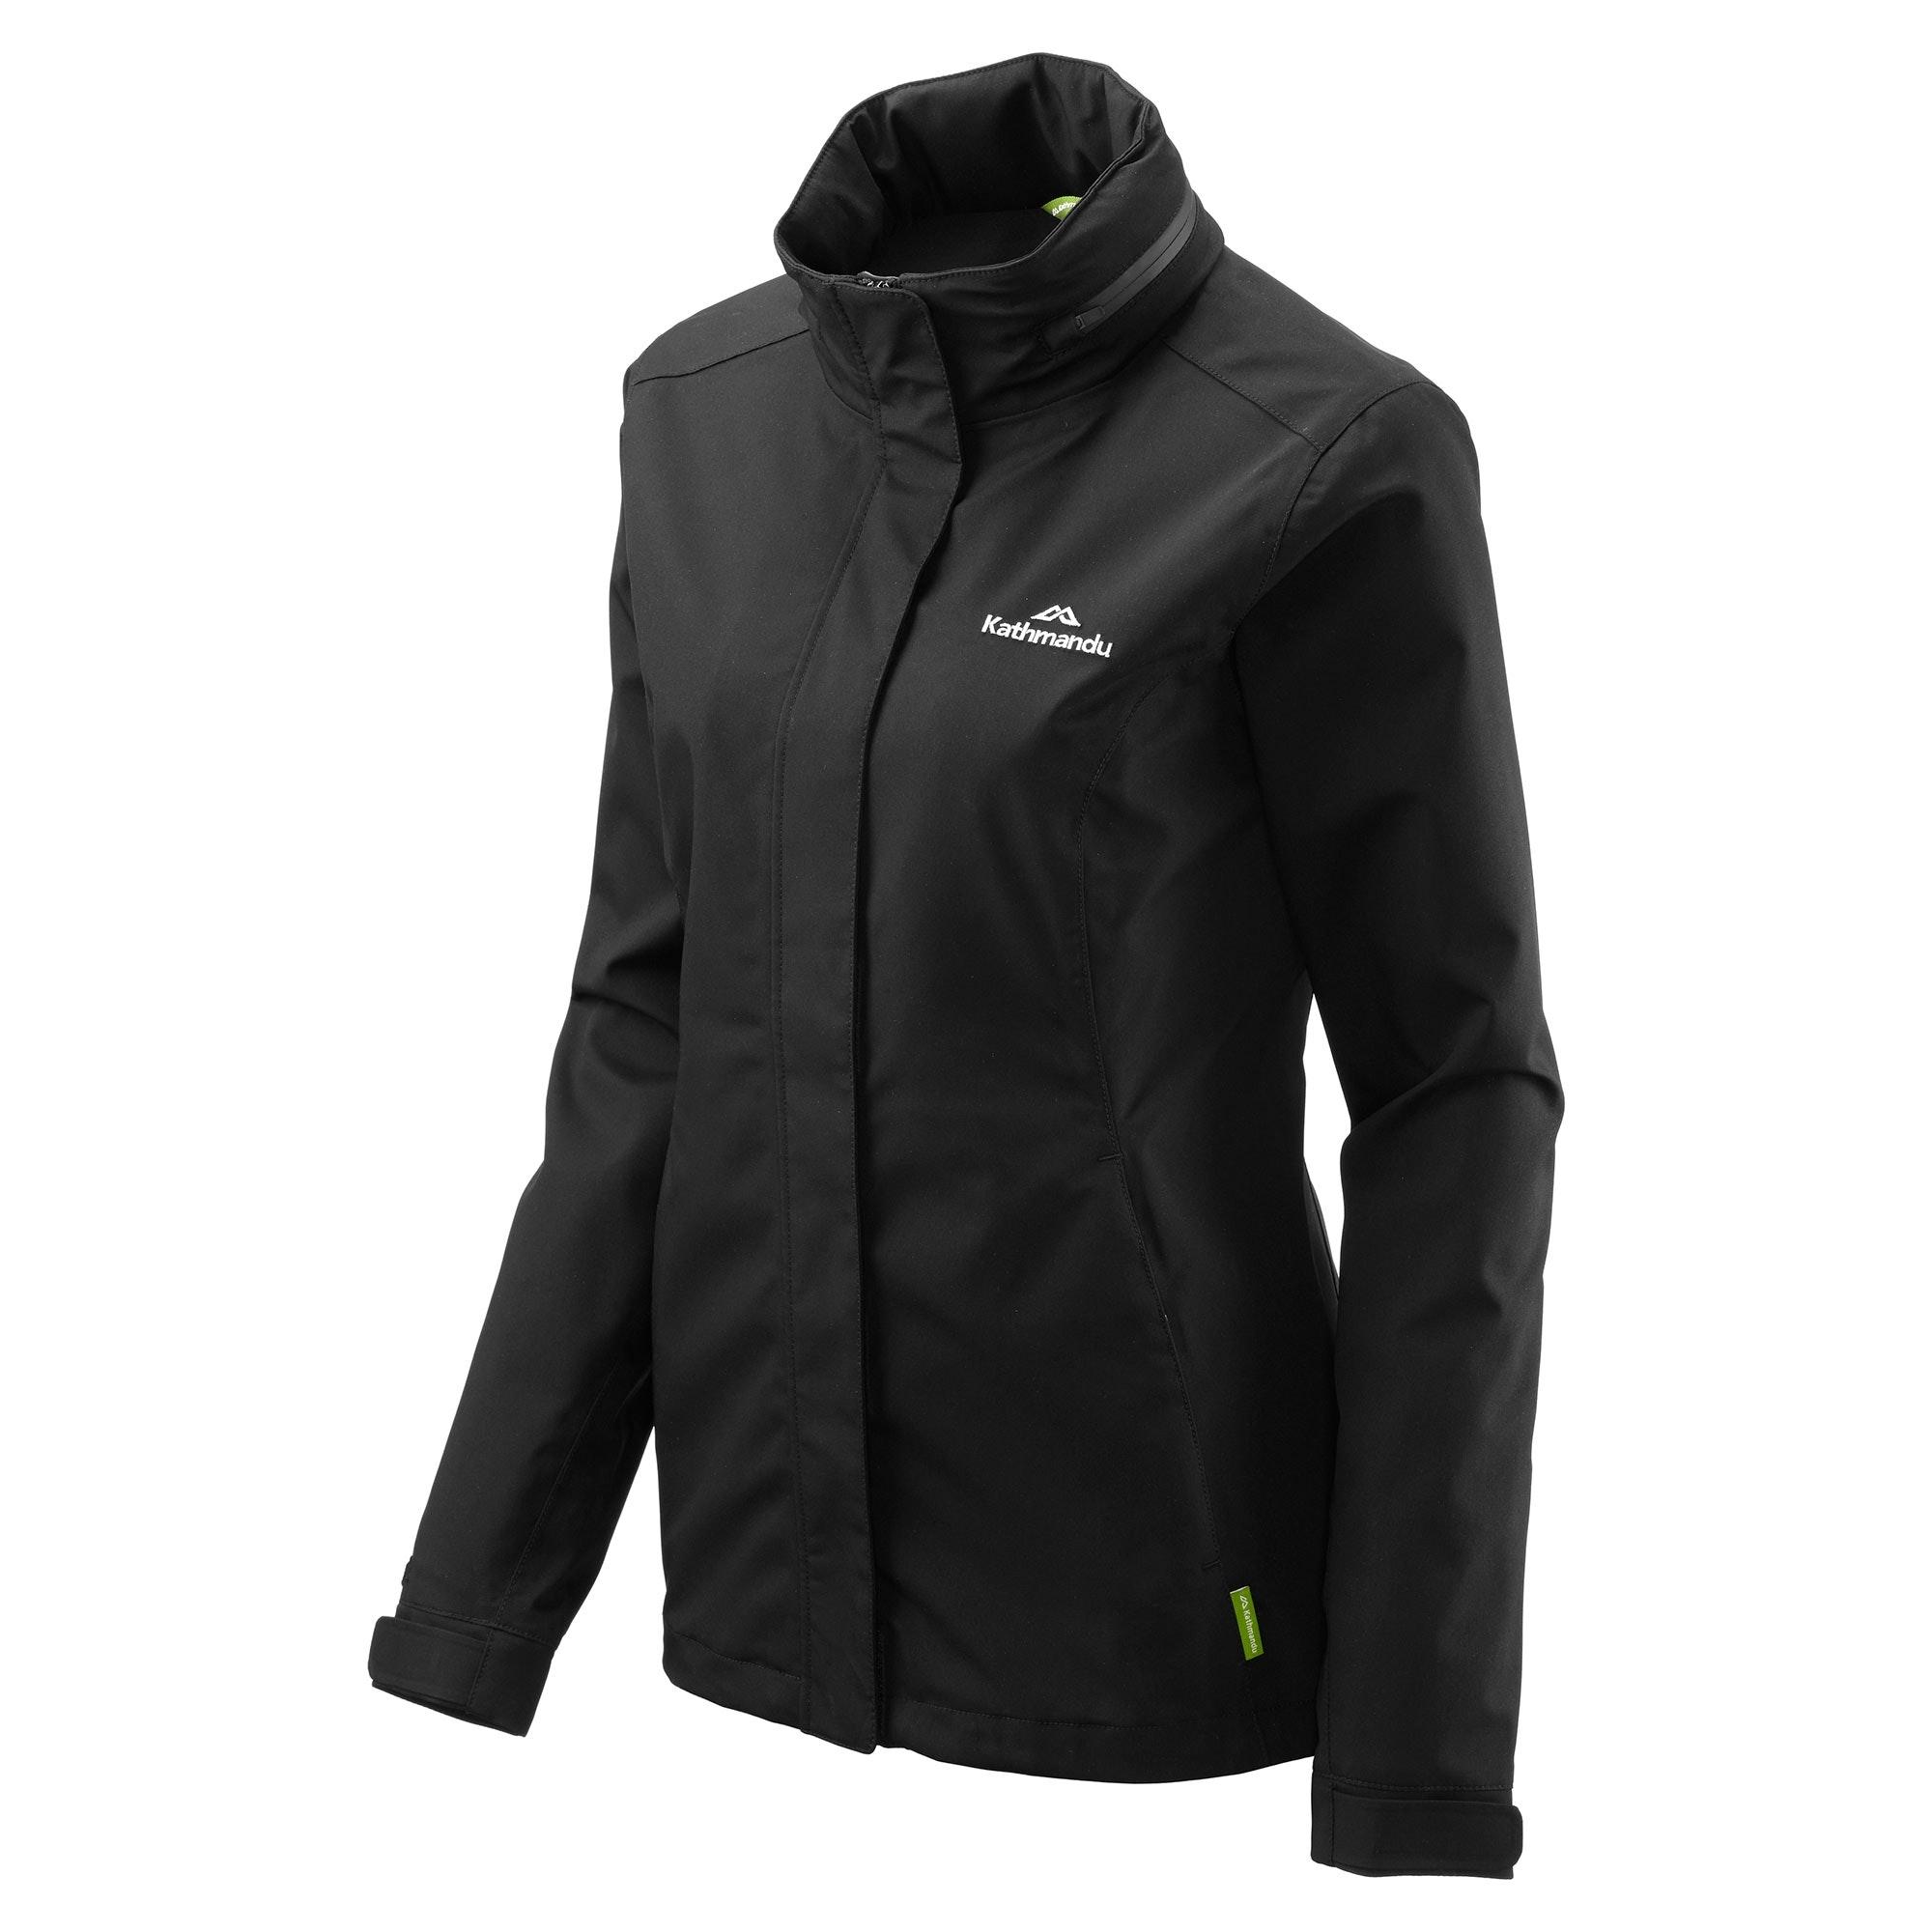 Kathmandu-Andulo-Womens-2-Layer-Windproof-Waterproof-Outdoor-Hiking-Rain-Jacket thumbnail 8